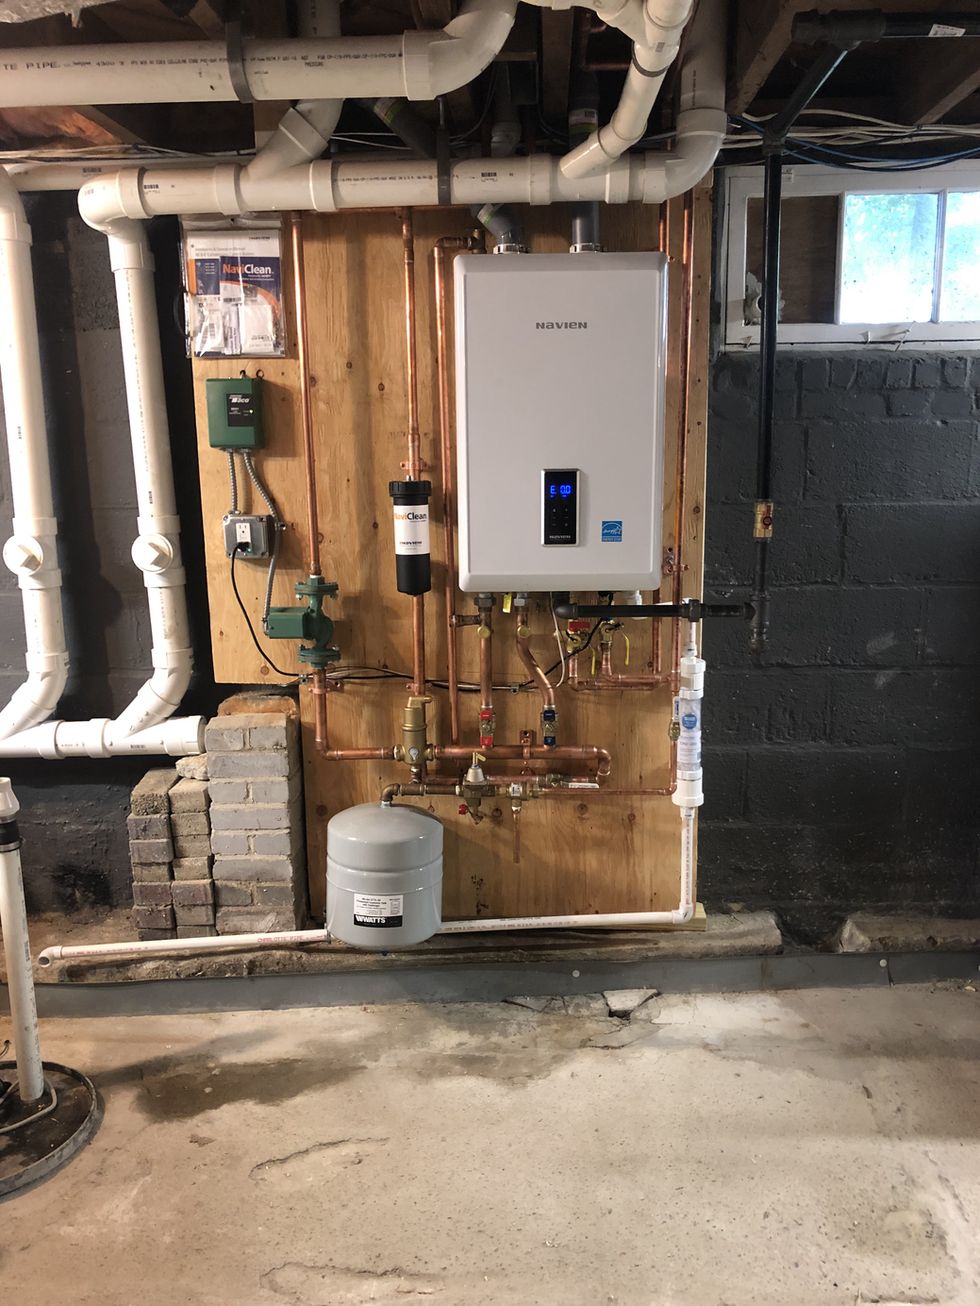 Combi Boiler & Tankless Water Heater